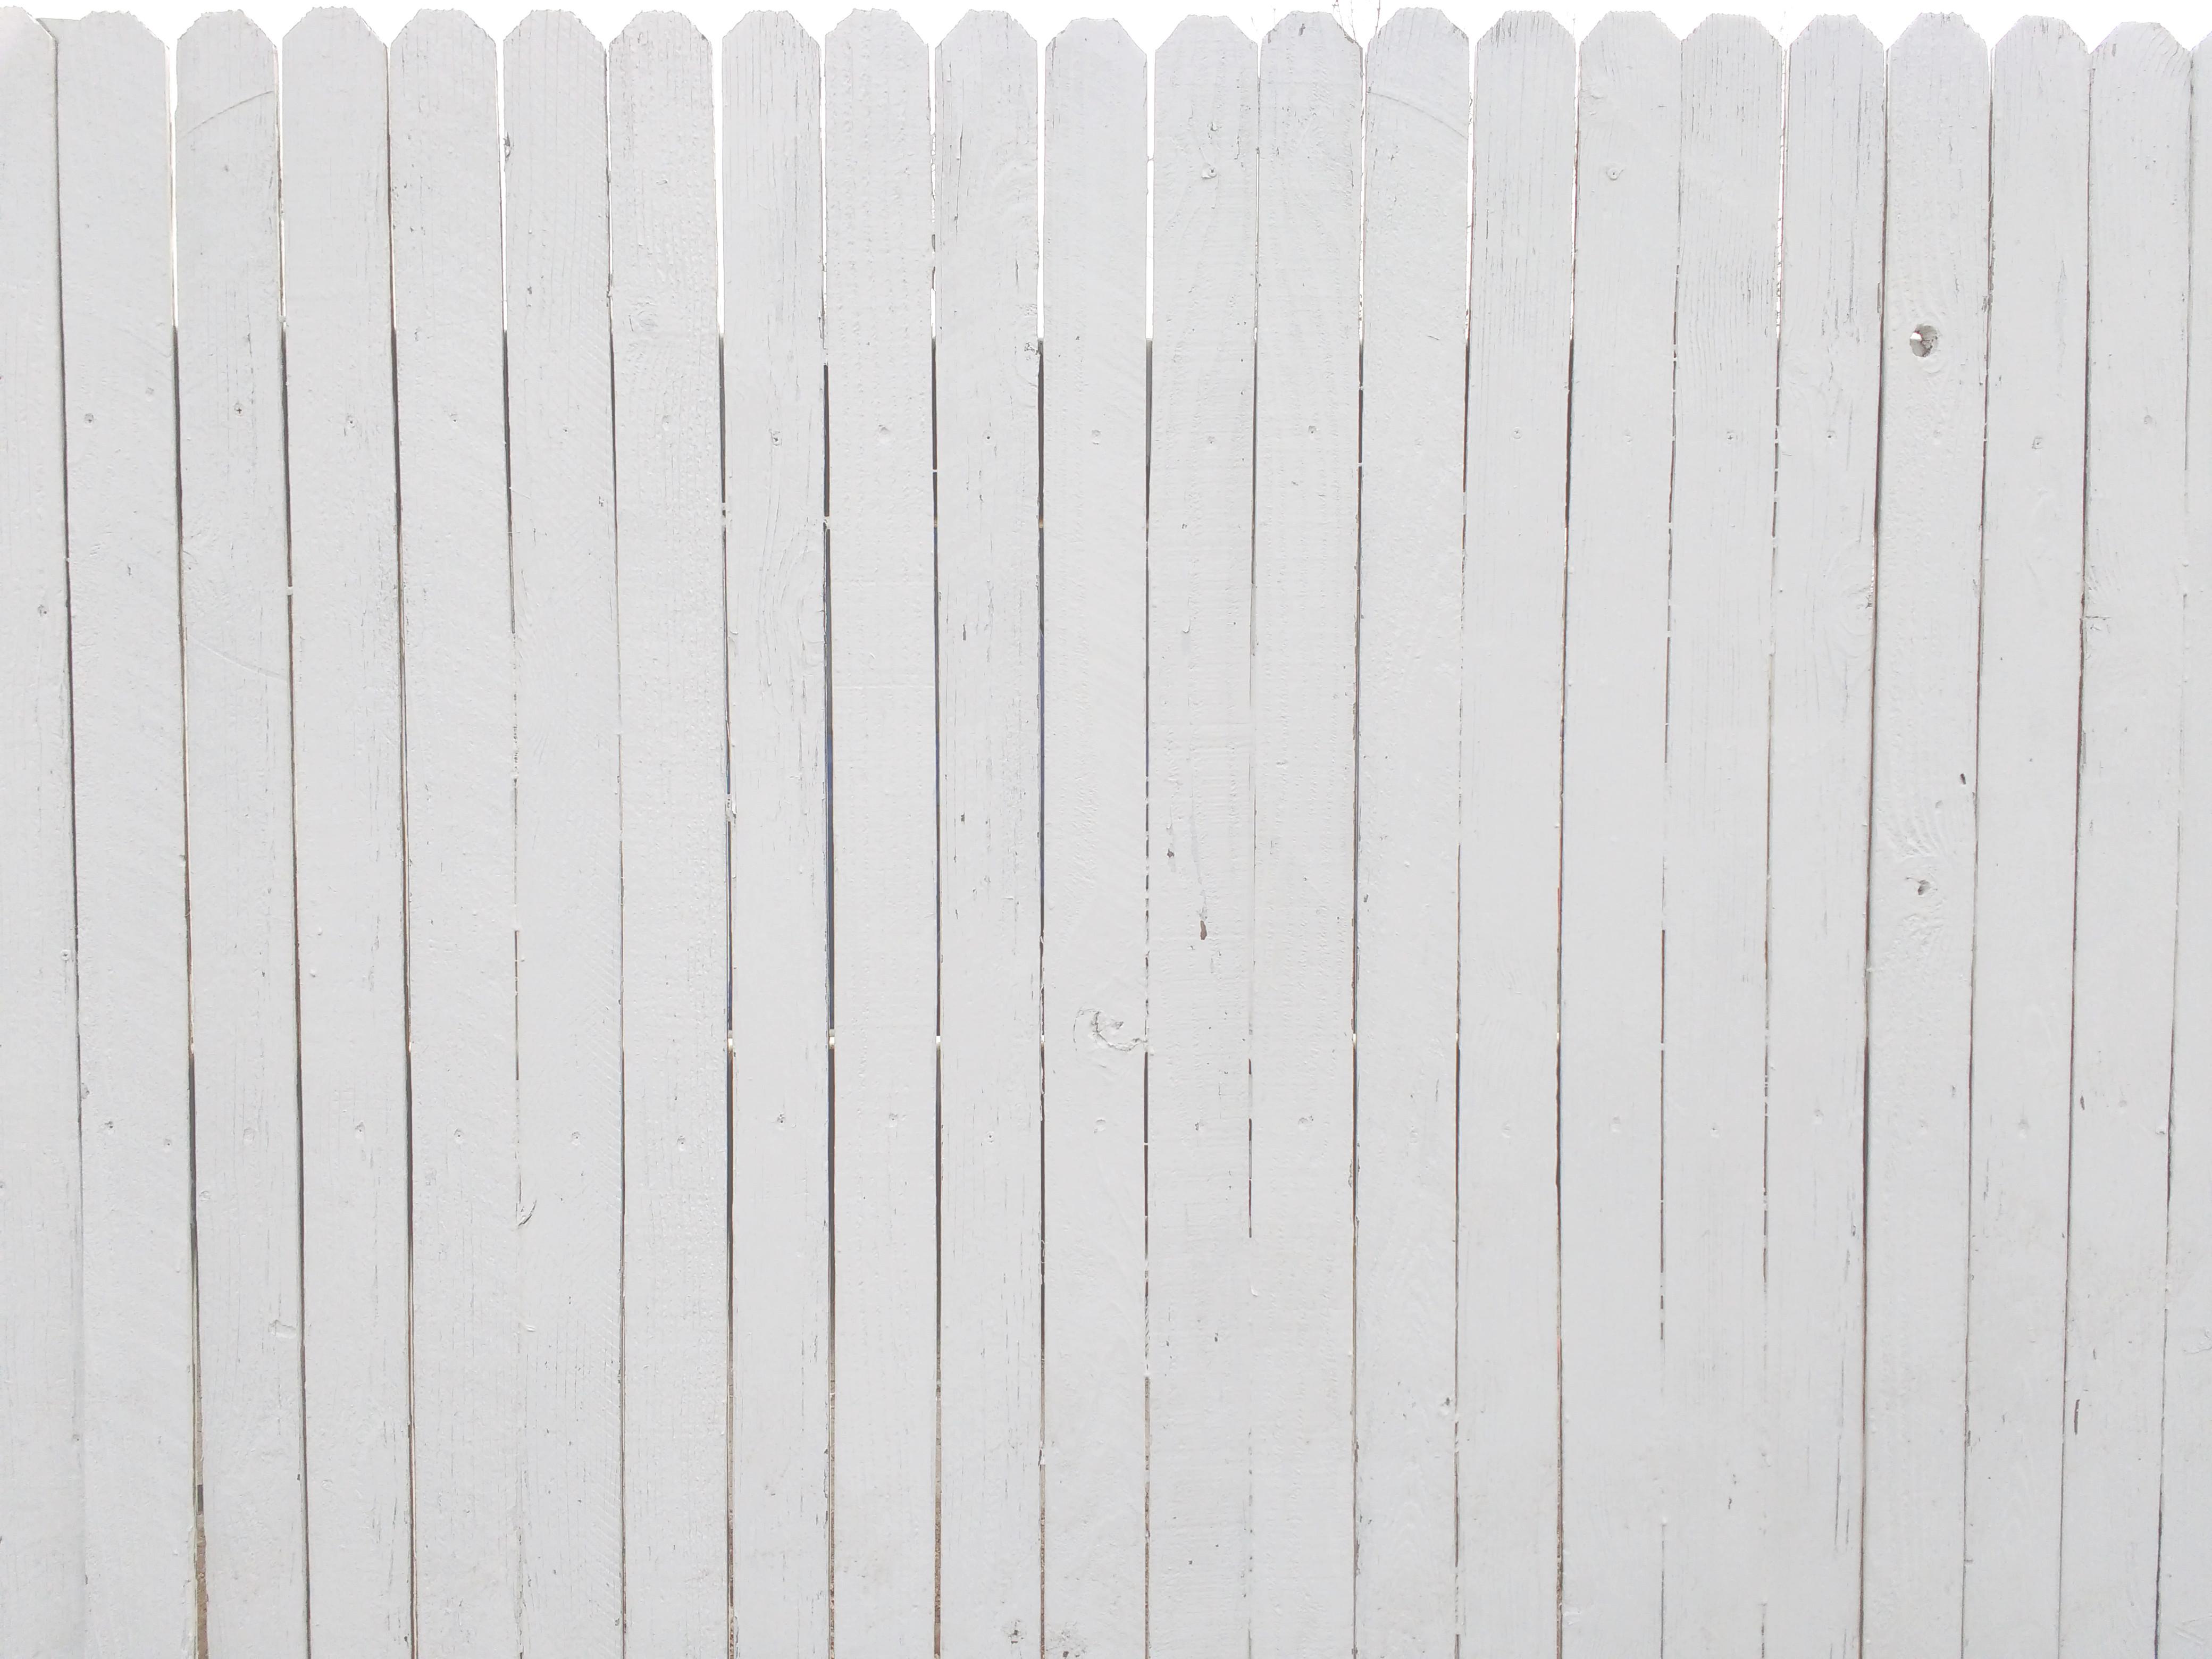 White Painted Fence Texture Picture Free Photograph Photos Public Domain